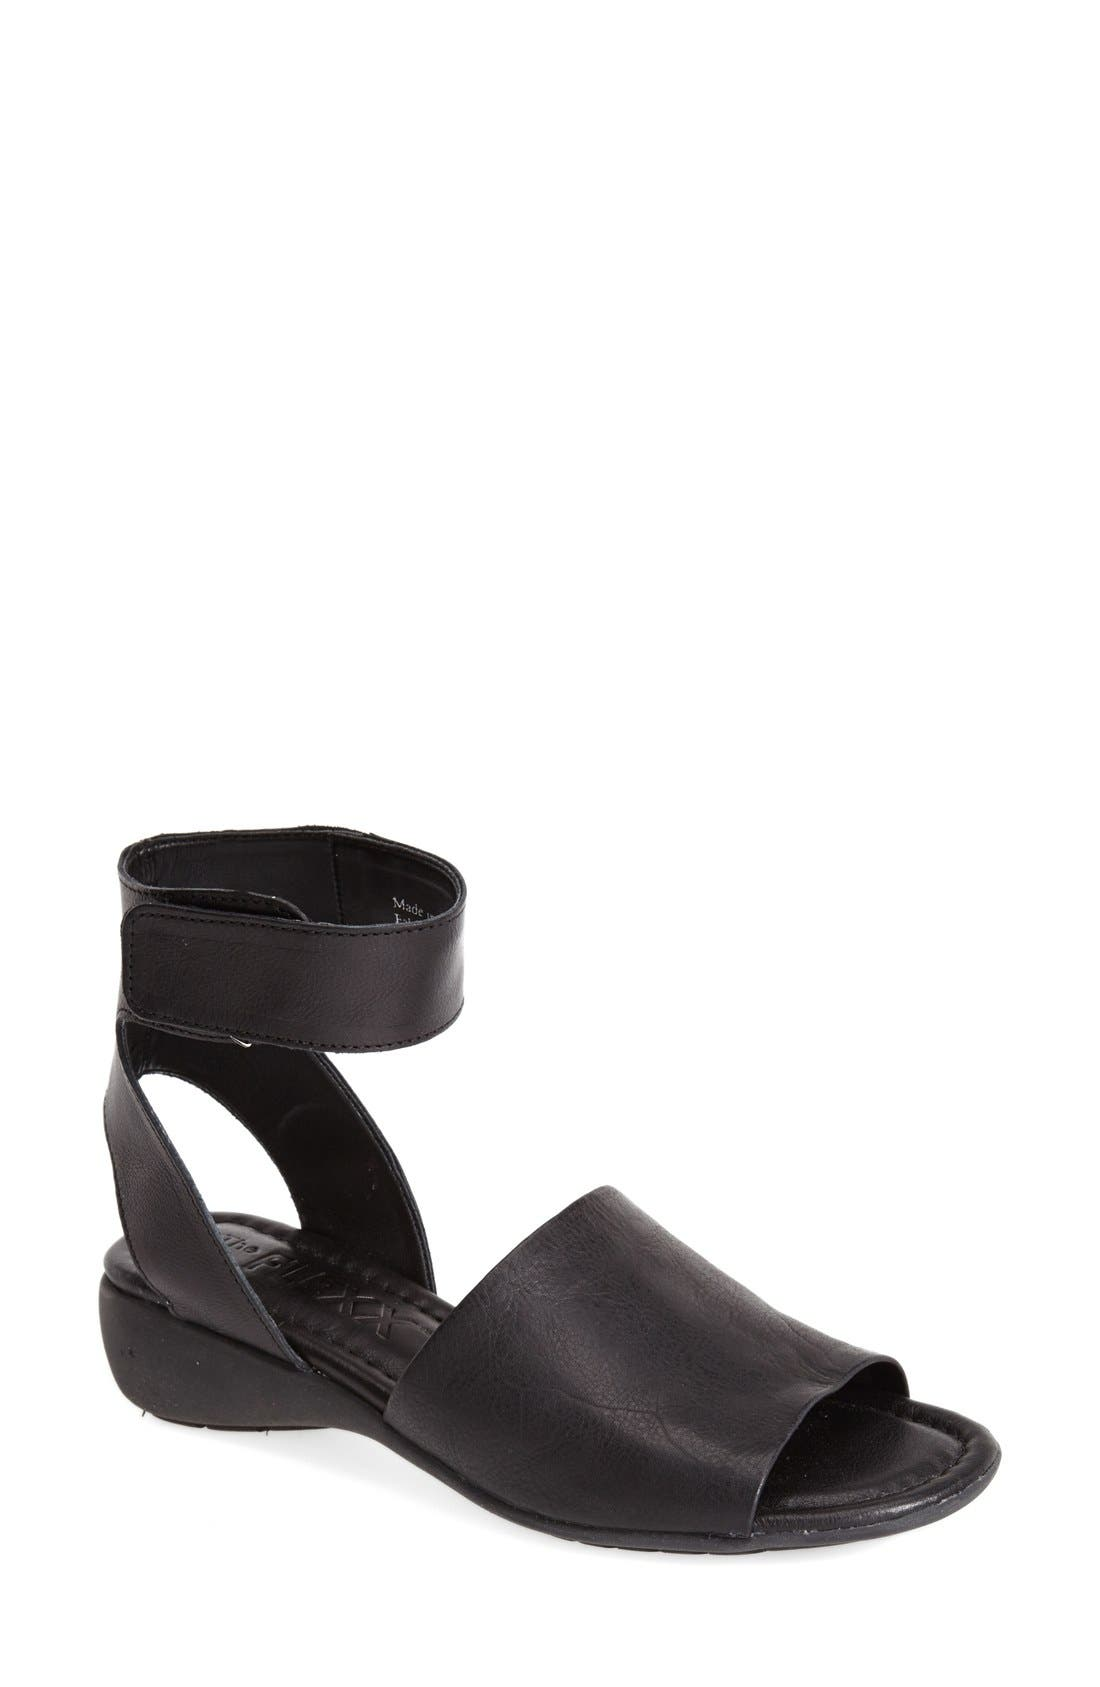 Alternate Image 1 Selected - The FLEXX 'Beglad' Leather Ankle Strap Sandal